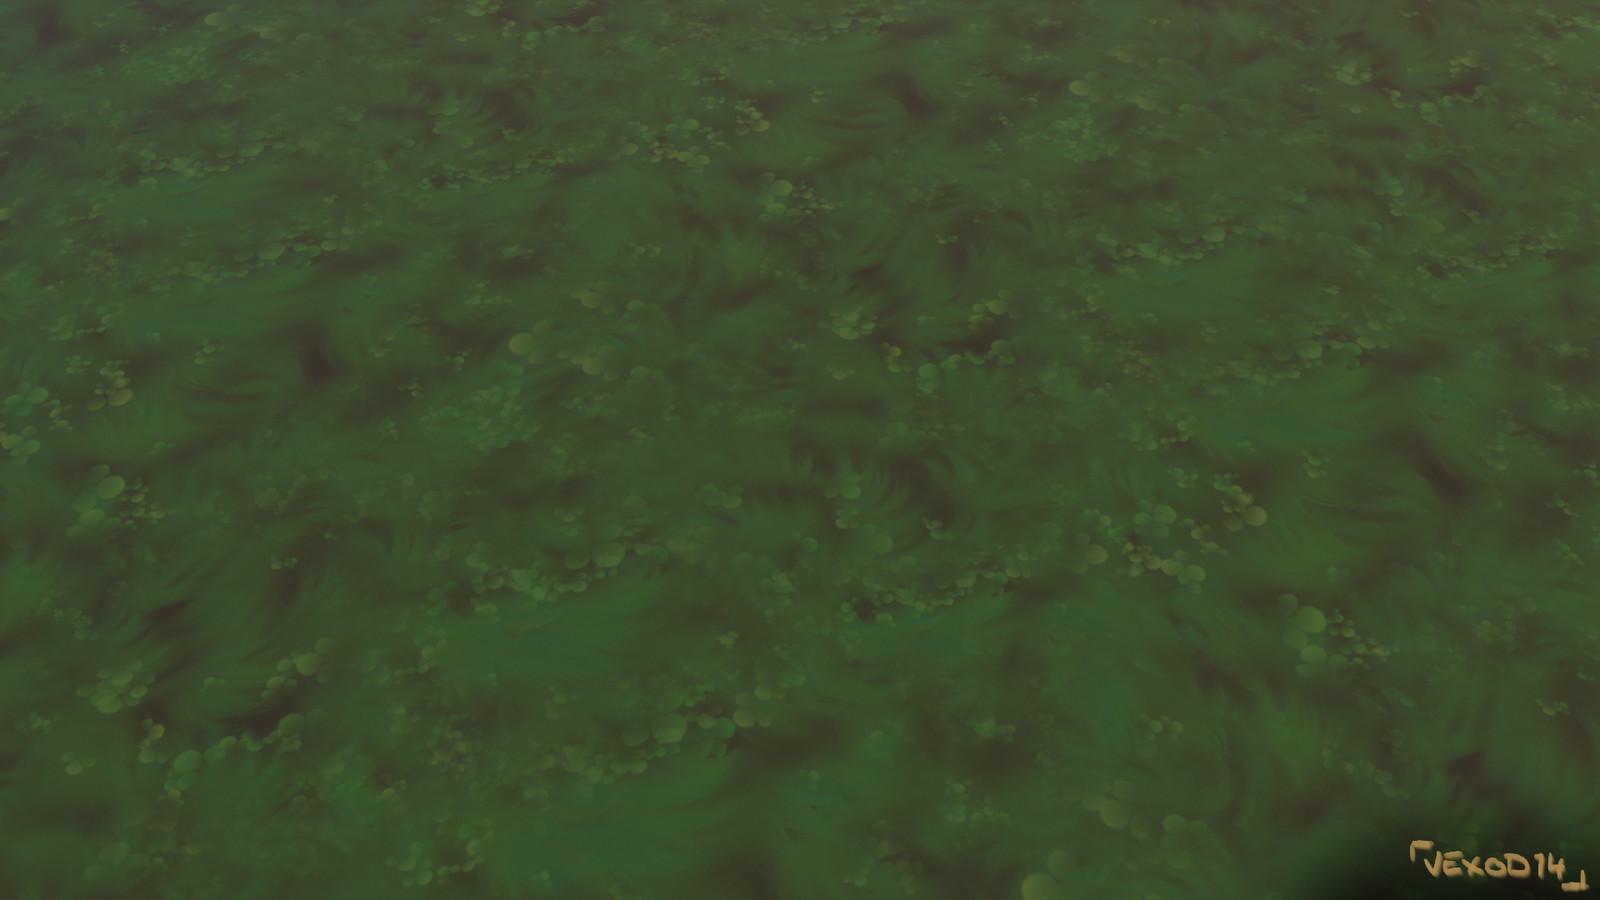 Tileable texture of grass